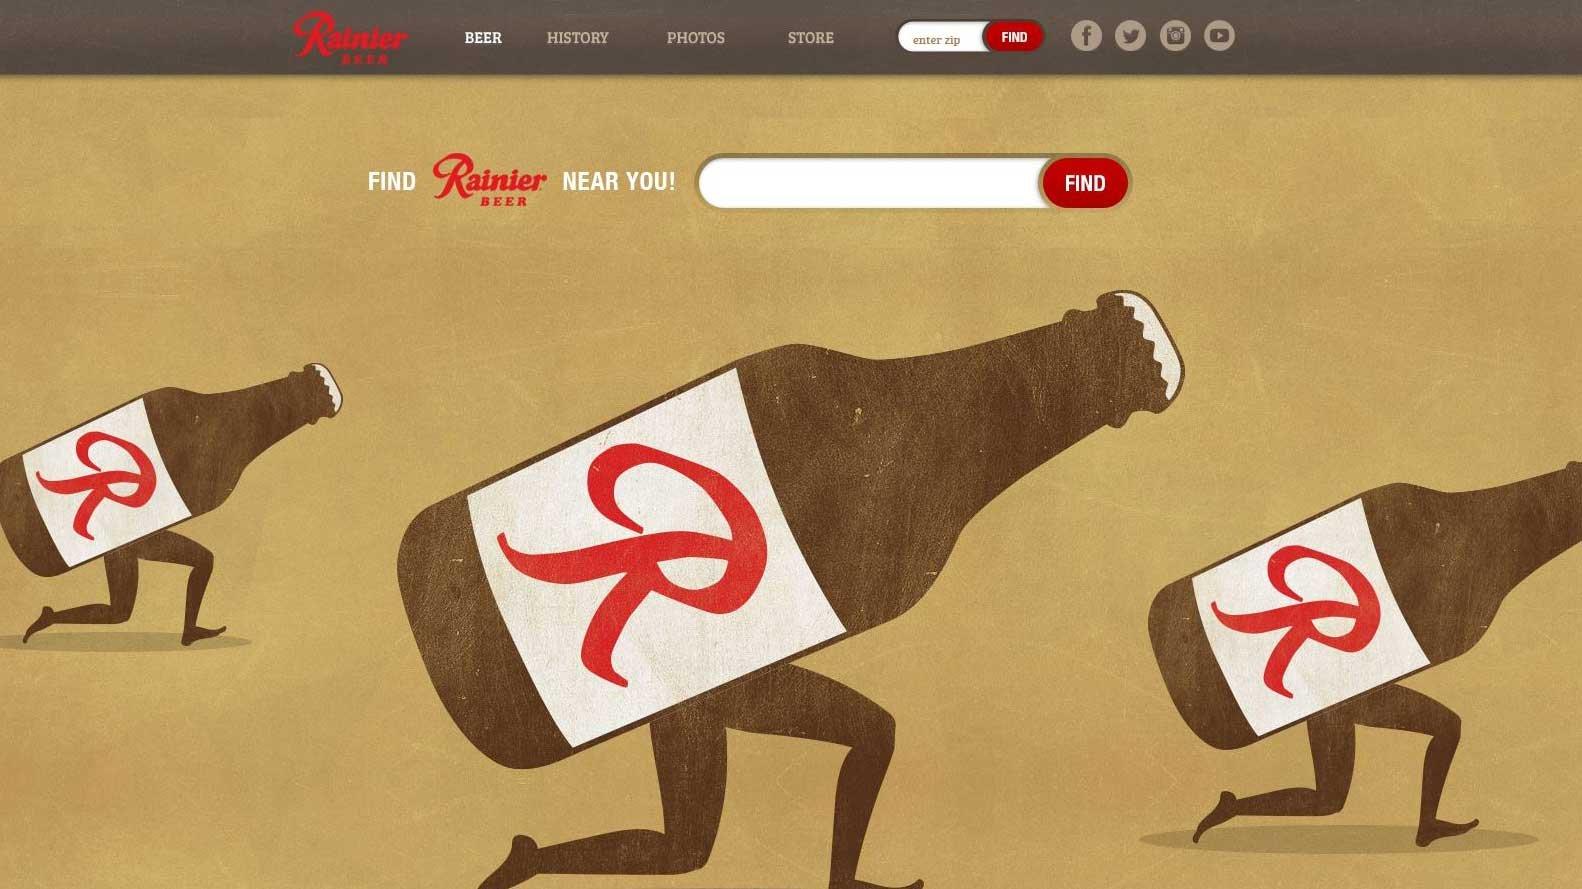 Screenshot of Rainier website